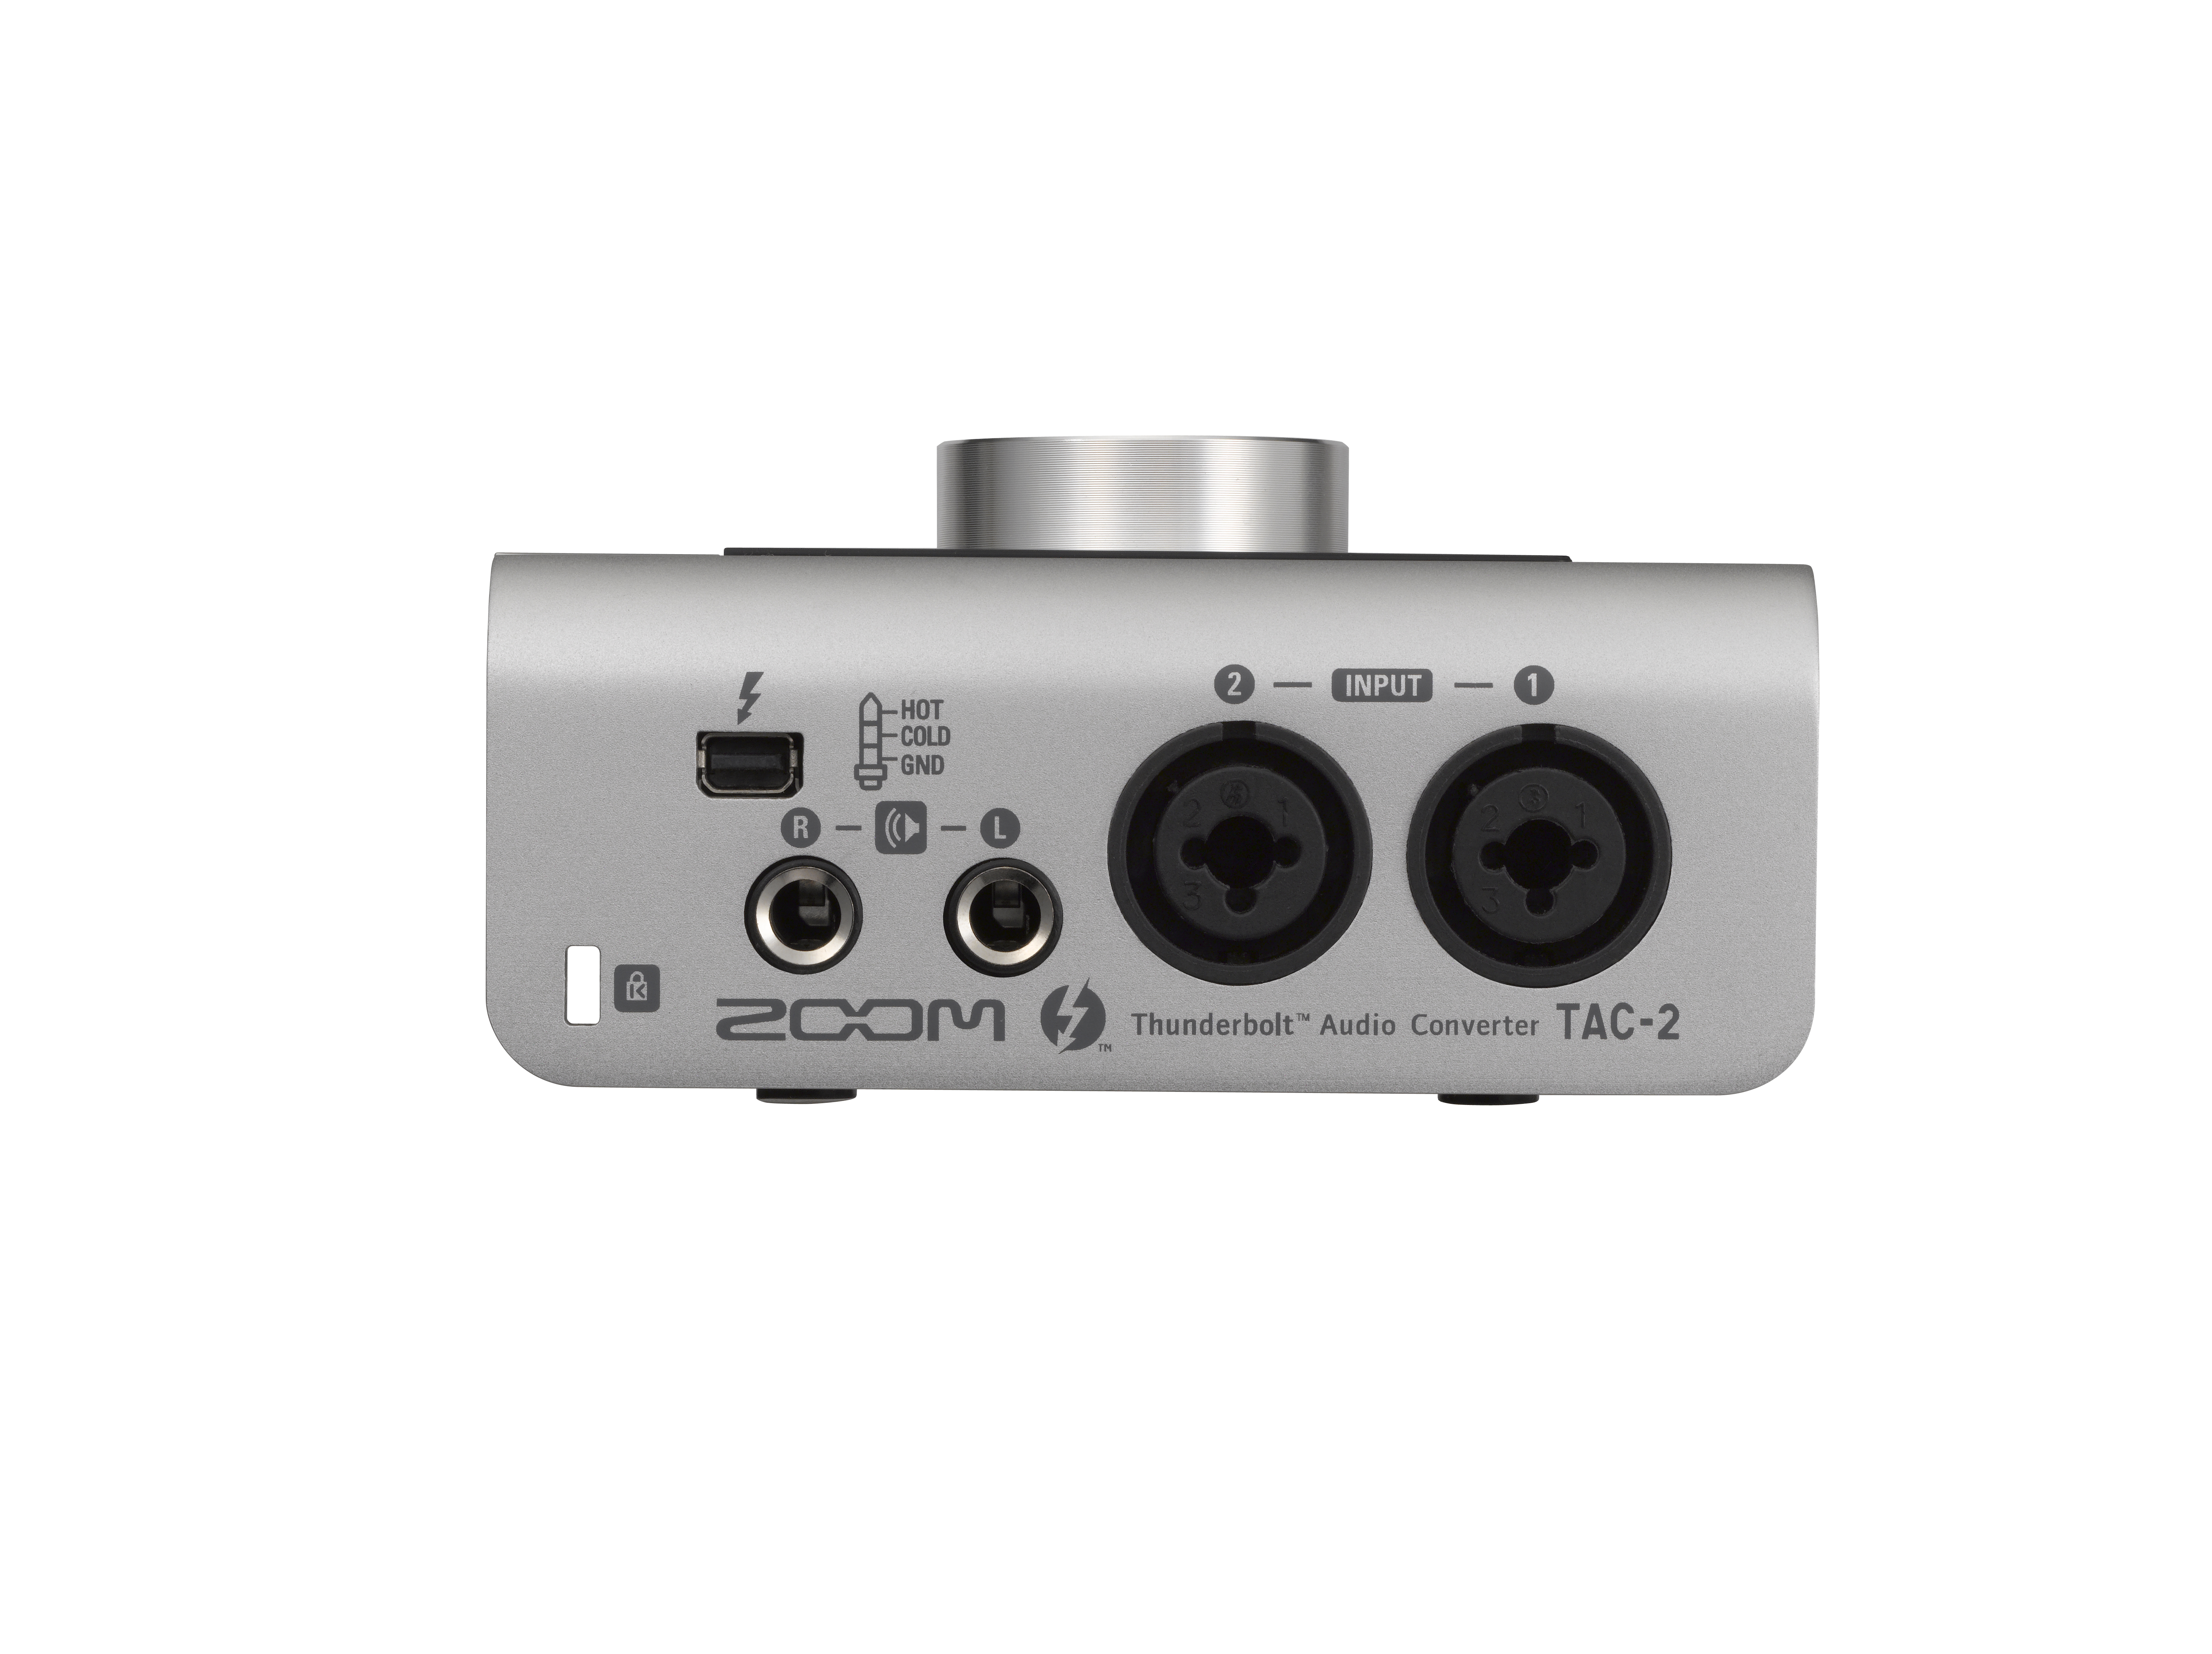 Art Line Level Converter : Tac 2 thunderbolt audio converter zoom